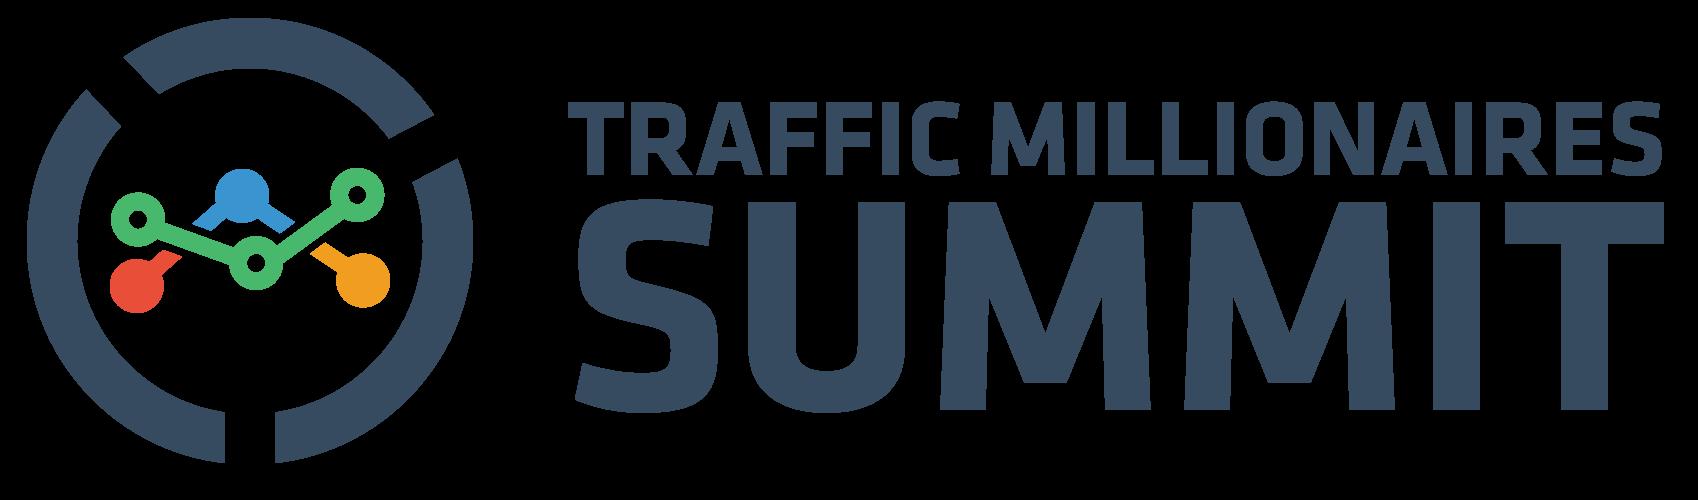 Traffic Millionaires Summit